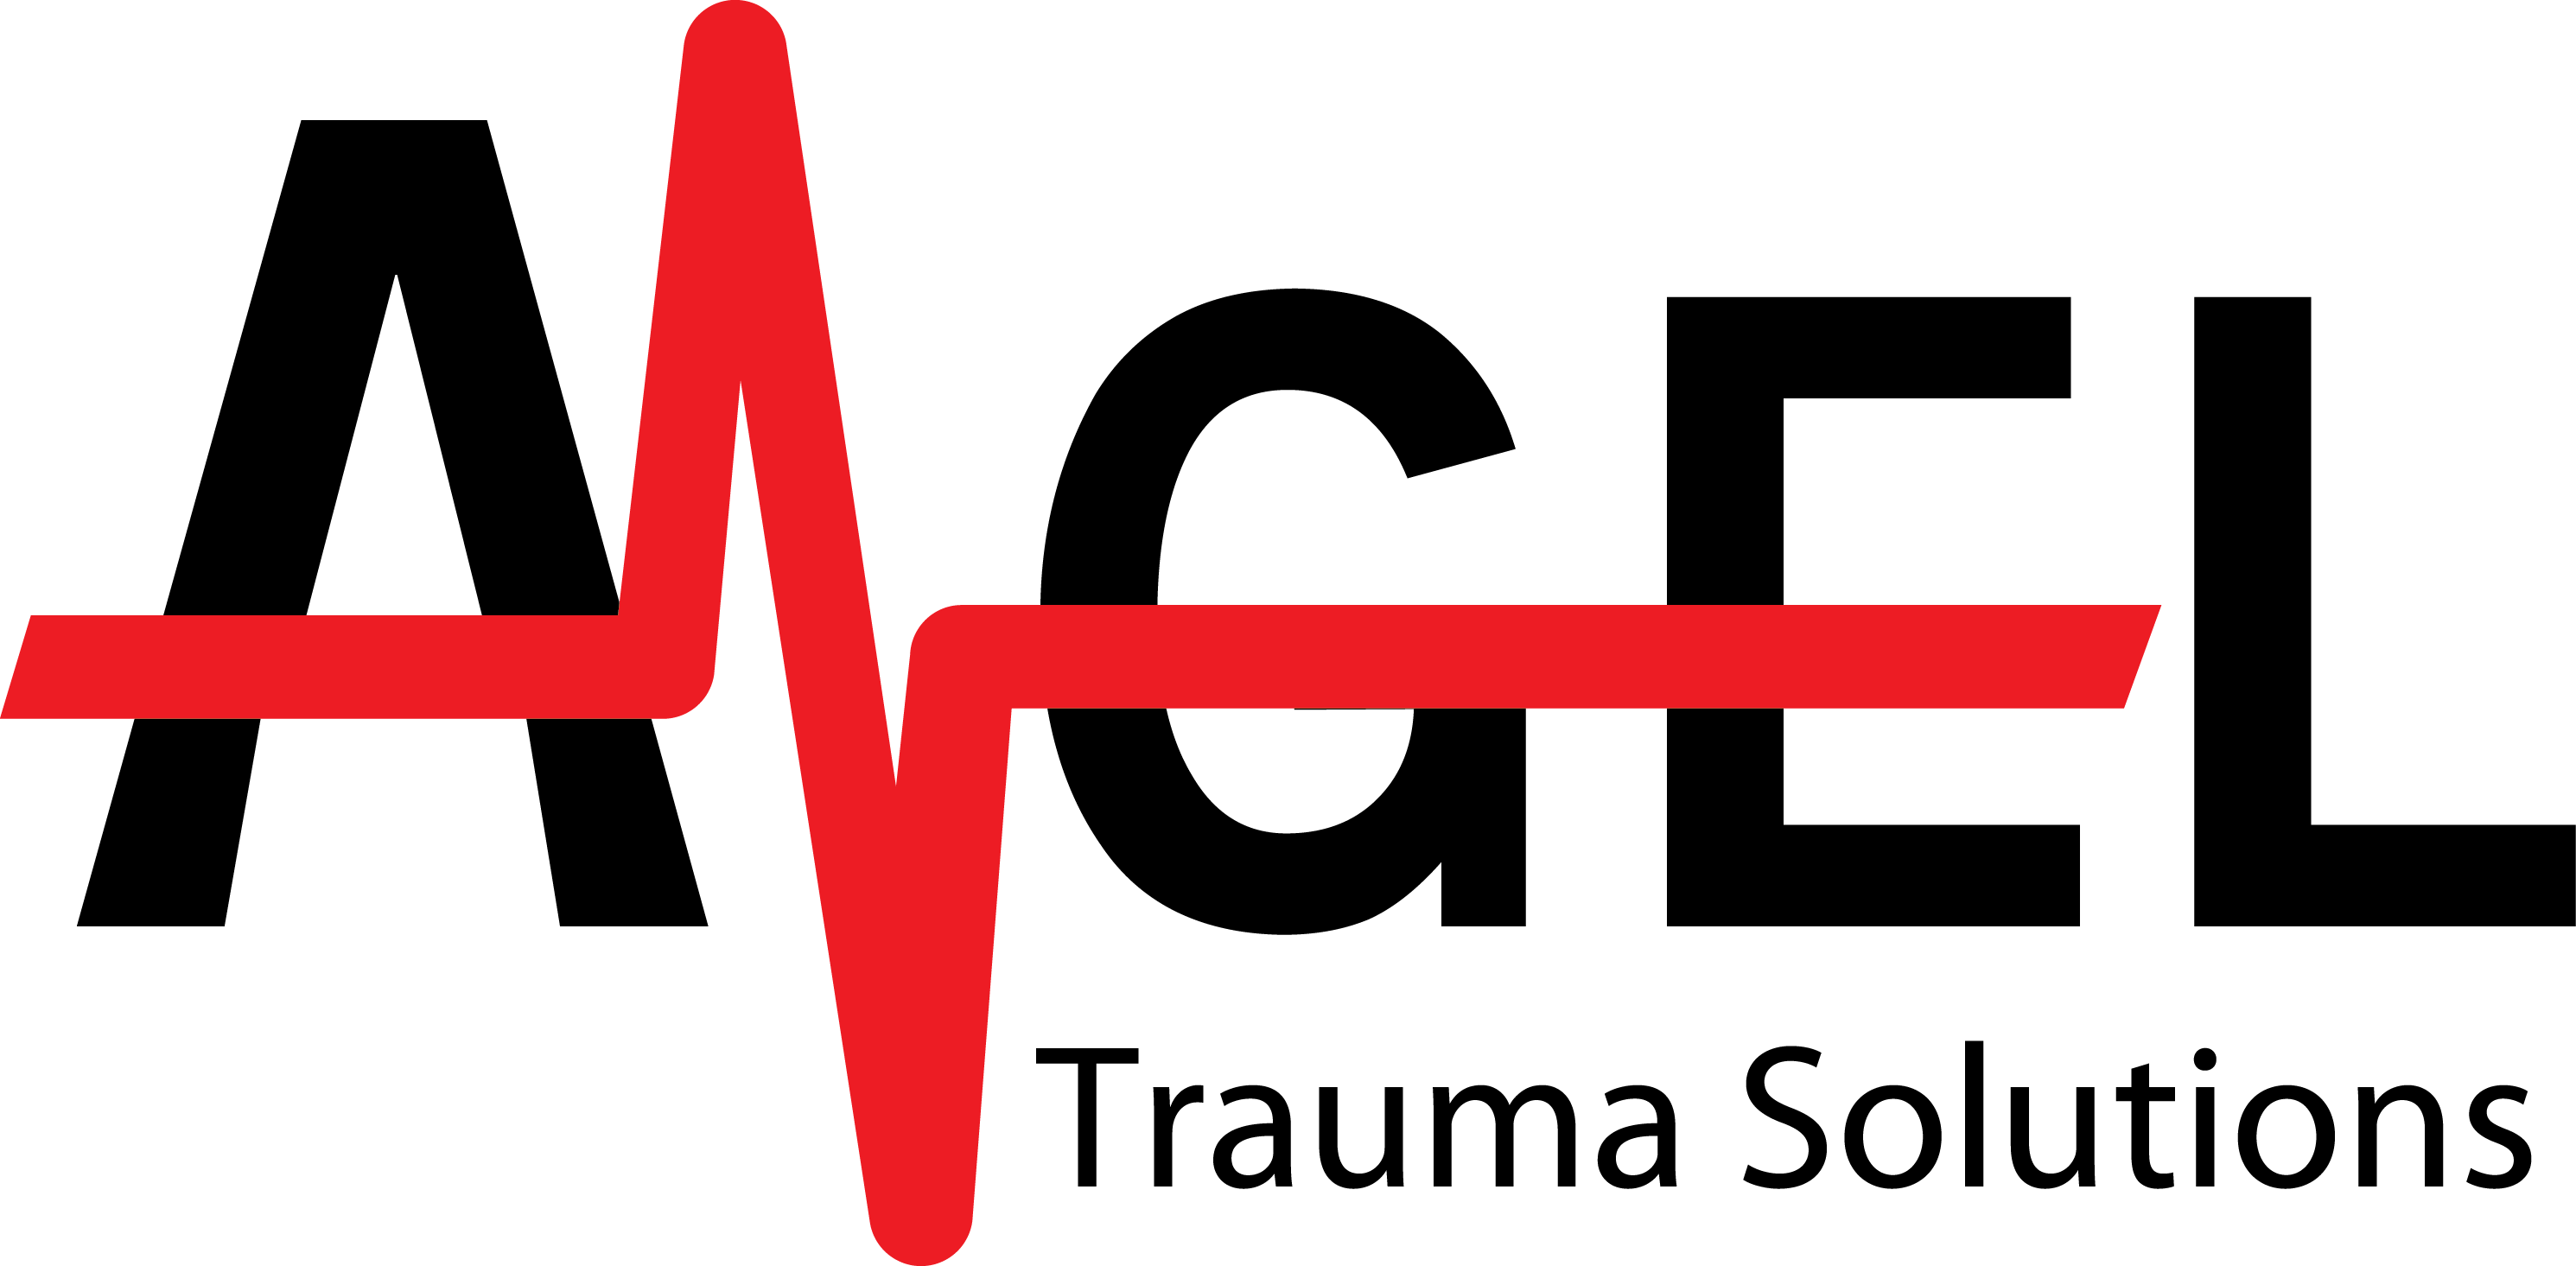 Angel Trauma Solutions providing quality bleeding control, CPR, AED, & First Aid training.